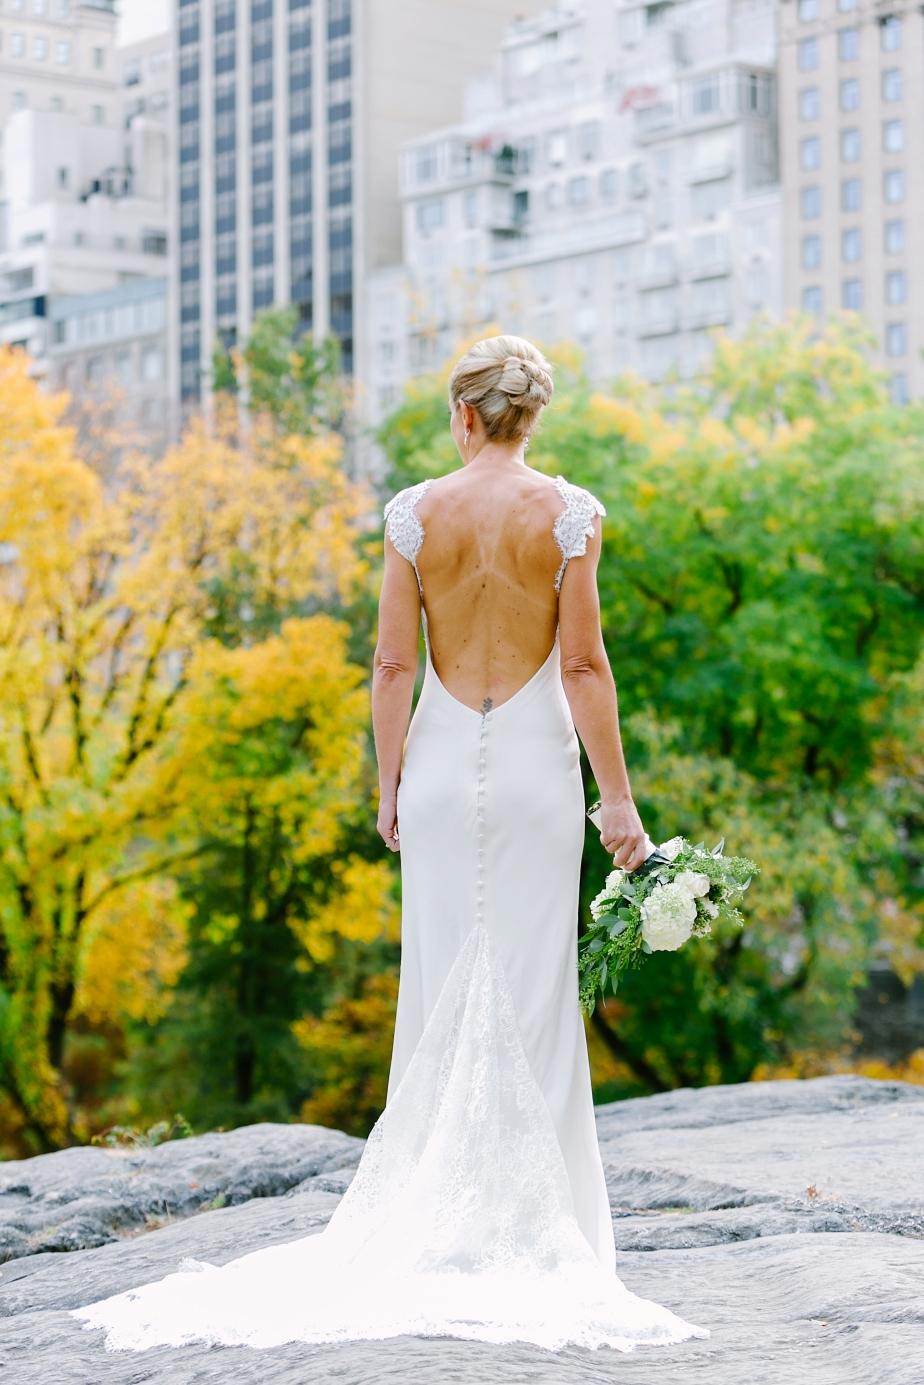 Copcot_centralpark_wedding_TS-179